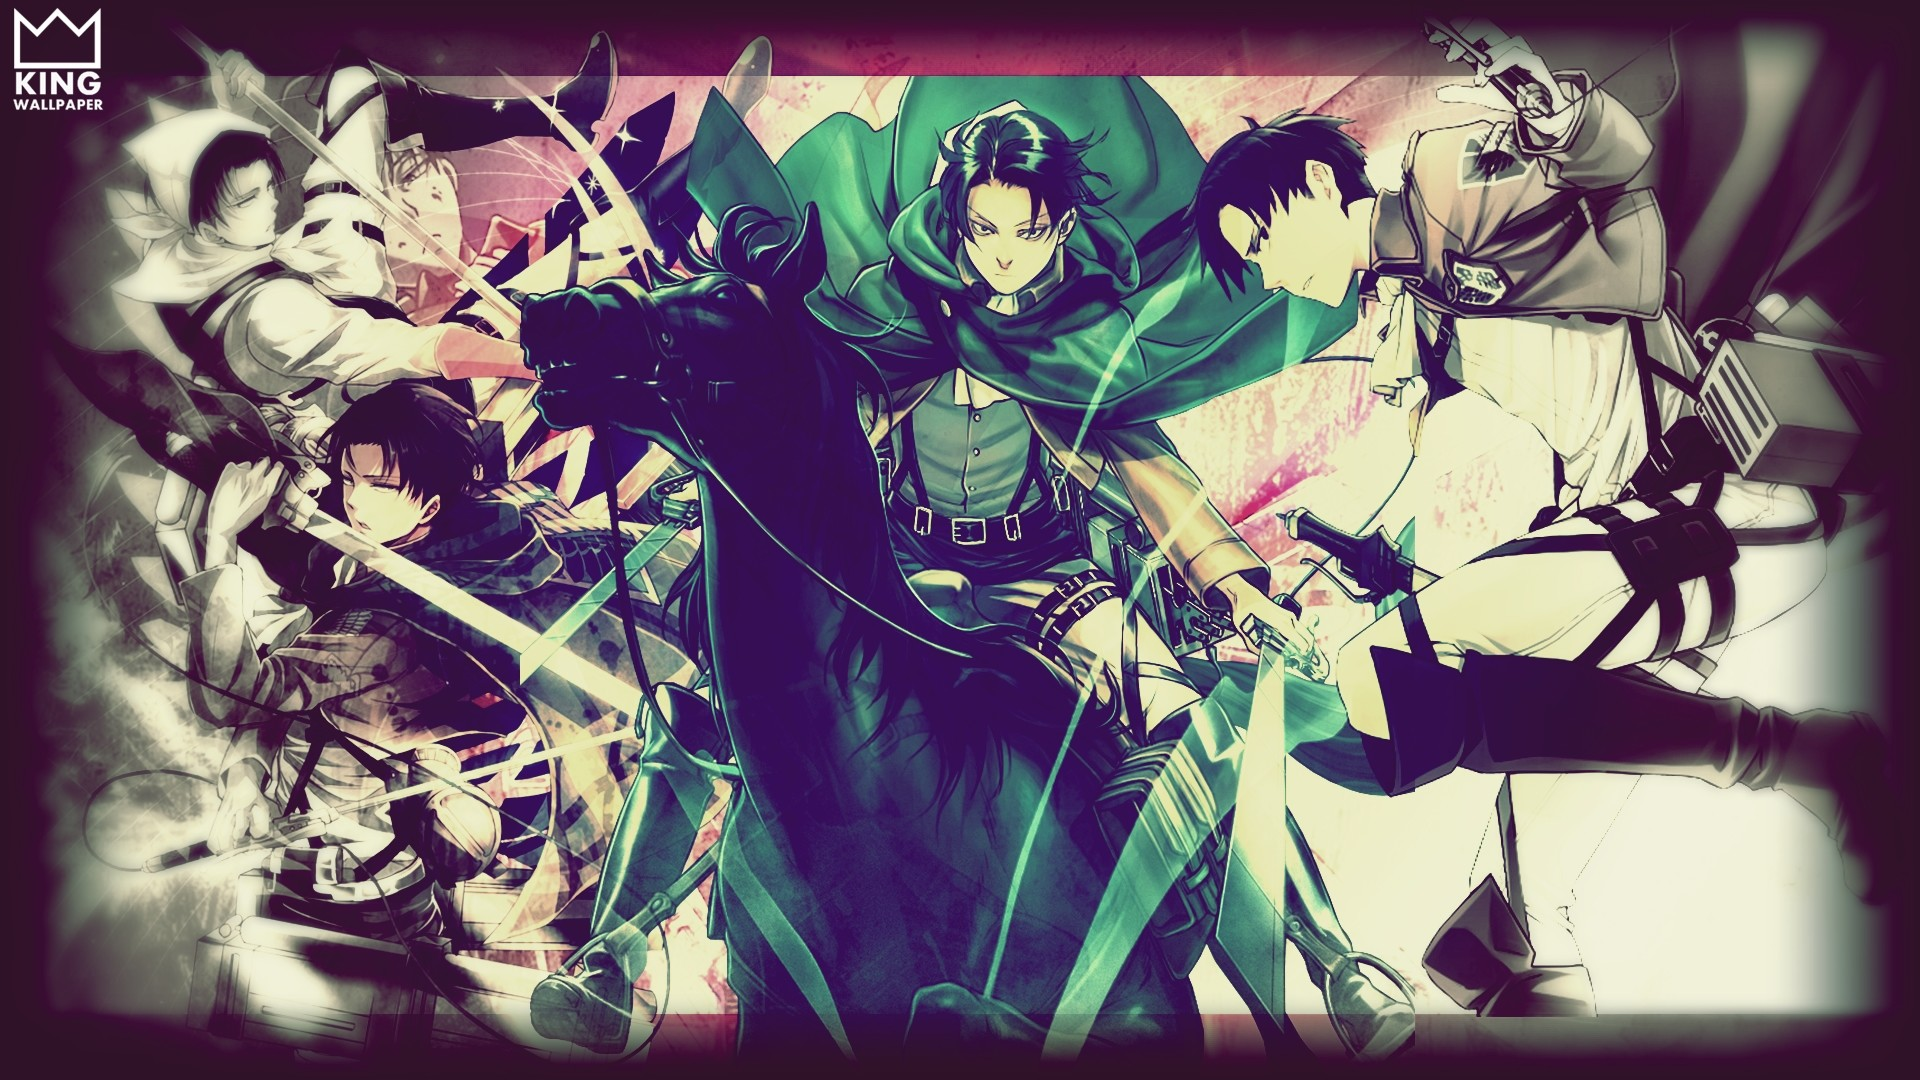 Levi Wallpaper – @Shingeki no Kyojin by Kingwallpaper on DeviantArt